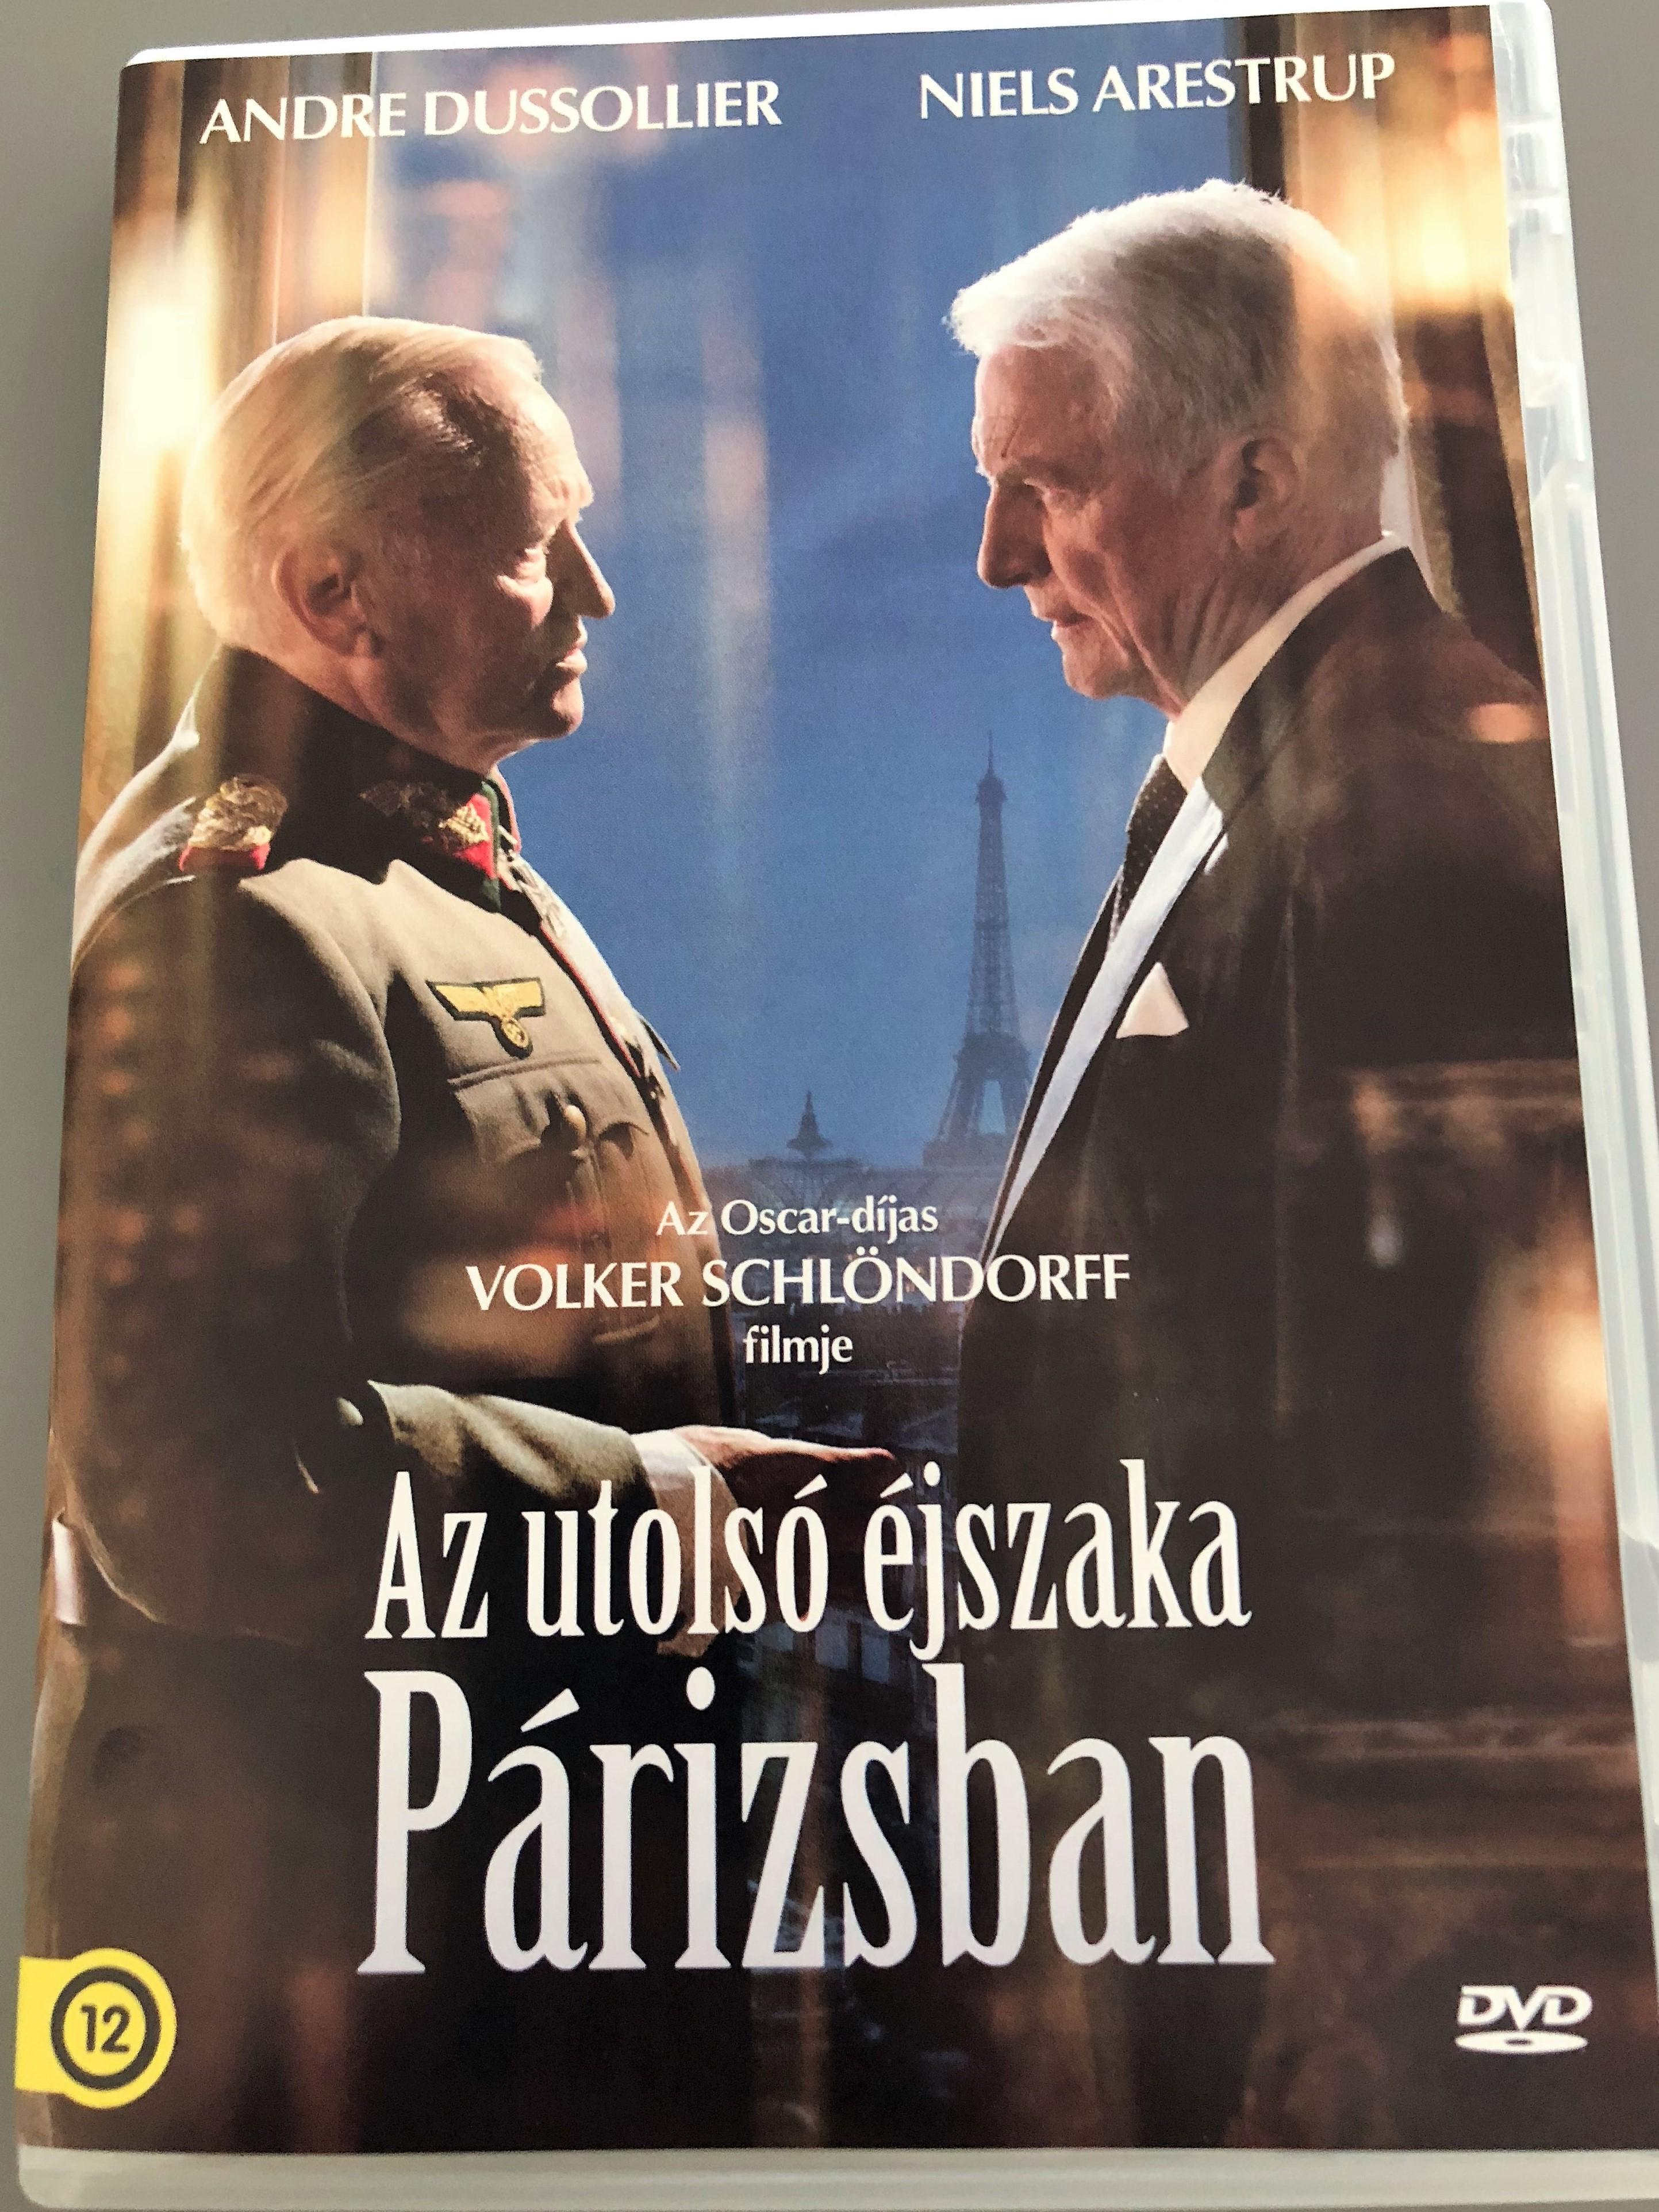 diplomatie-dvd-2014-az-utols-jszaka-p-rizsban-diplomacy-directed-by-volker-schl-ndorff-starring-andr-dussollier-niels-arestrup-based-on-cyril-gely-s-diplomatie-historical-drama-film-1-.jpg